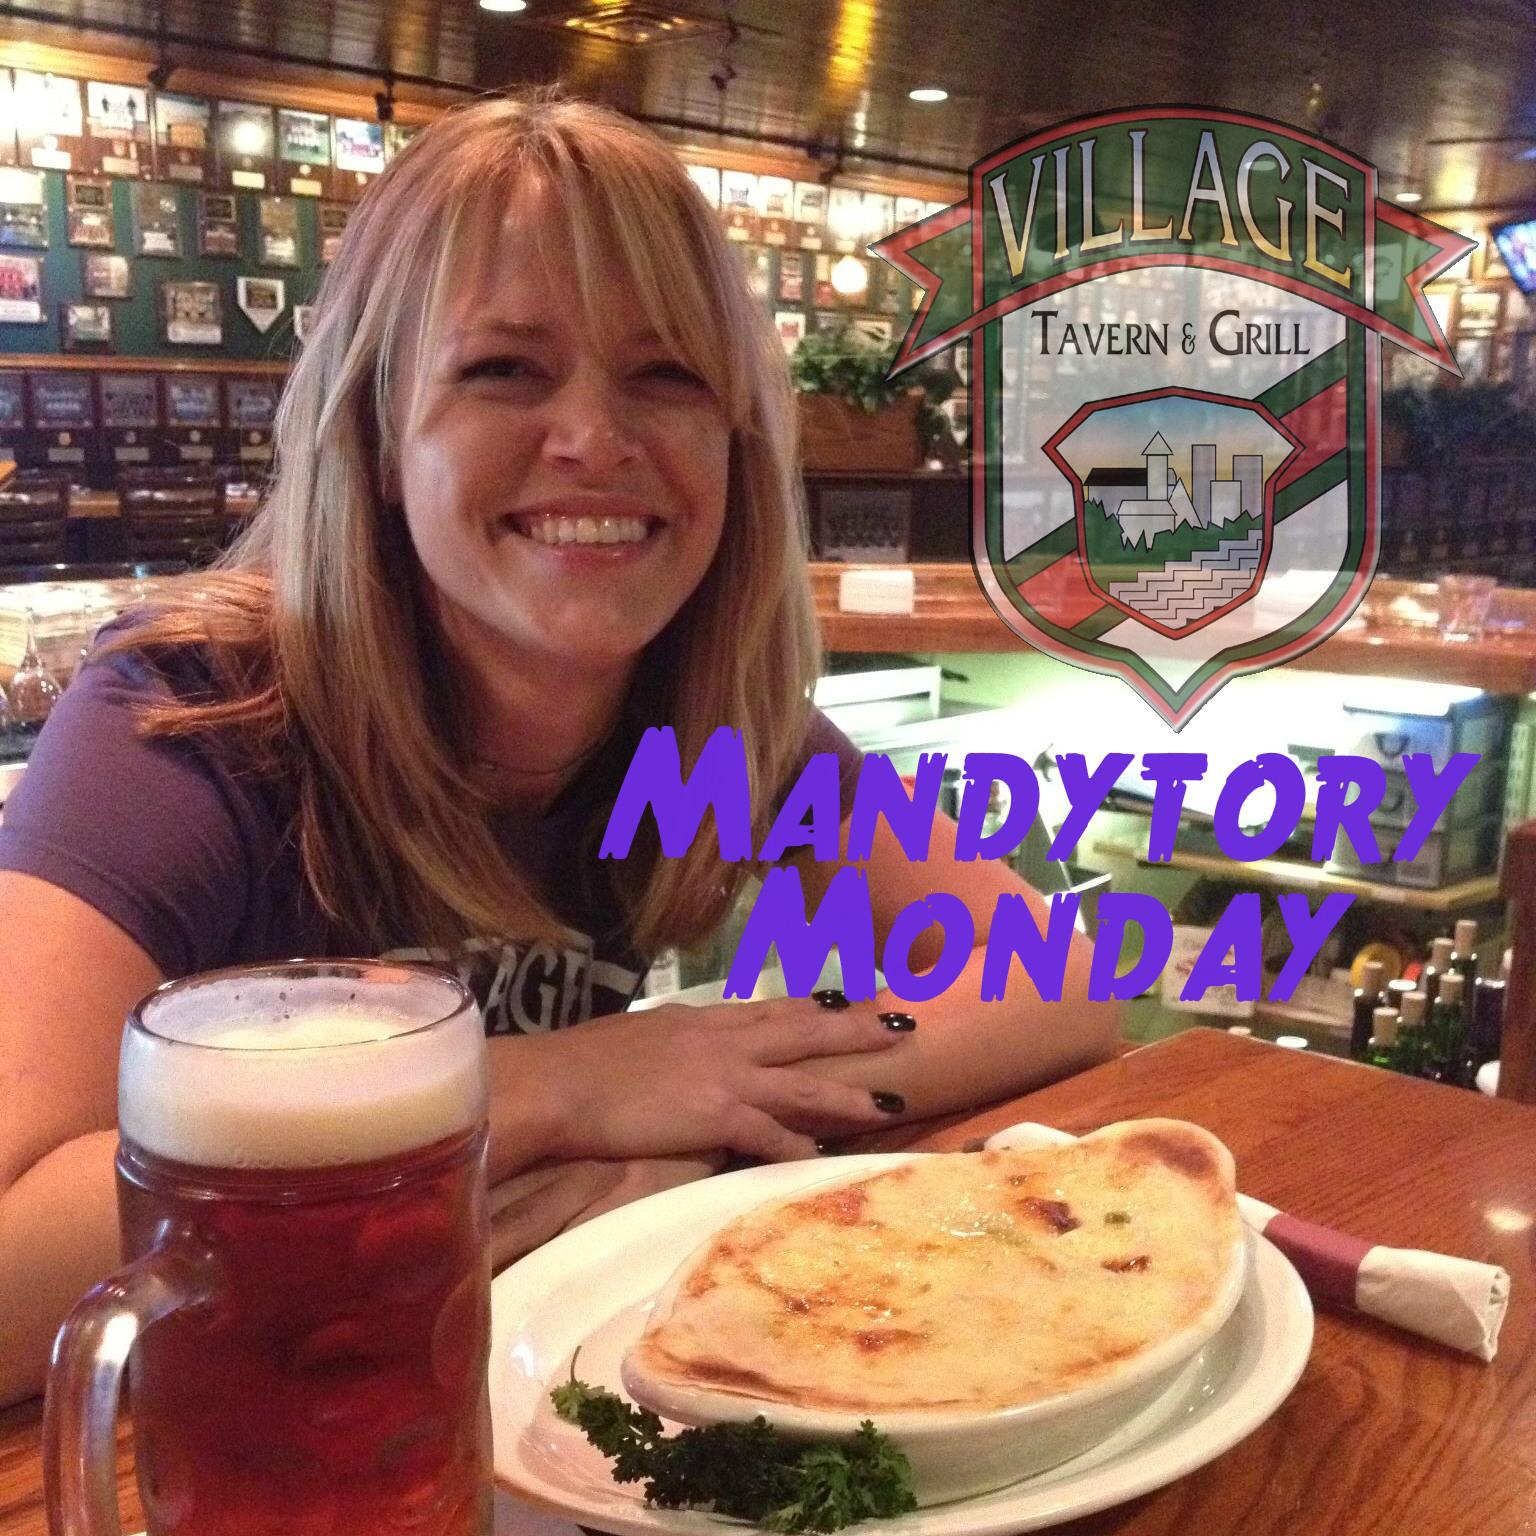 Mandytory Monday.jpg